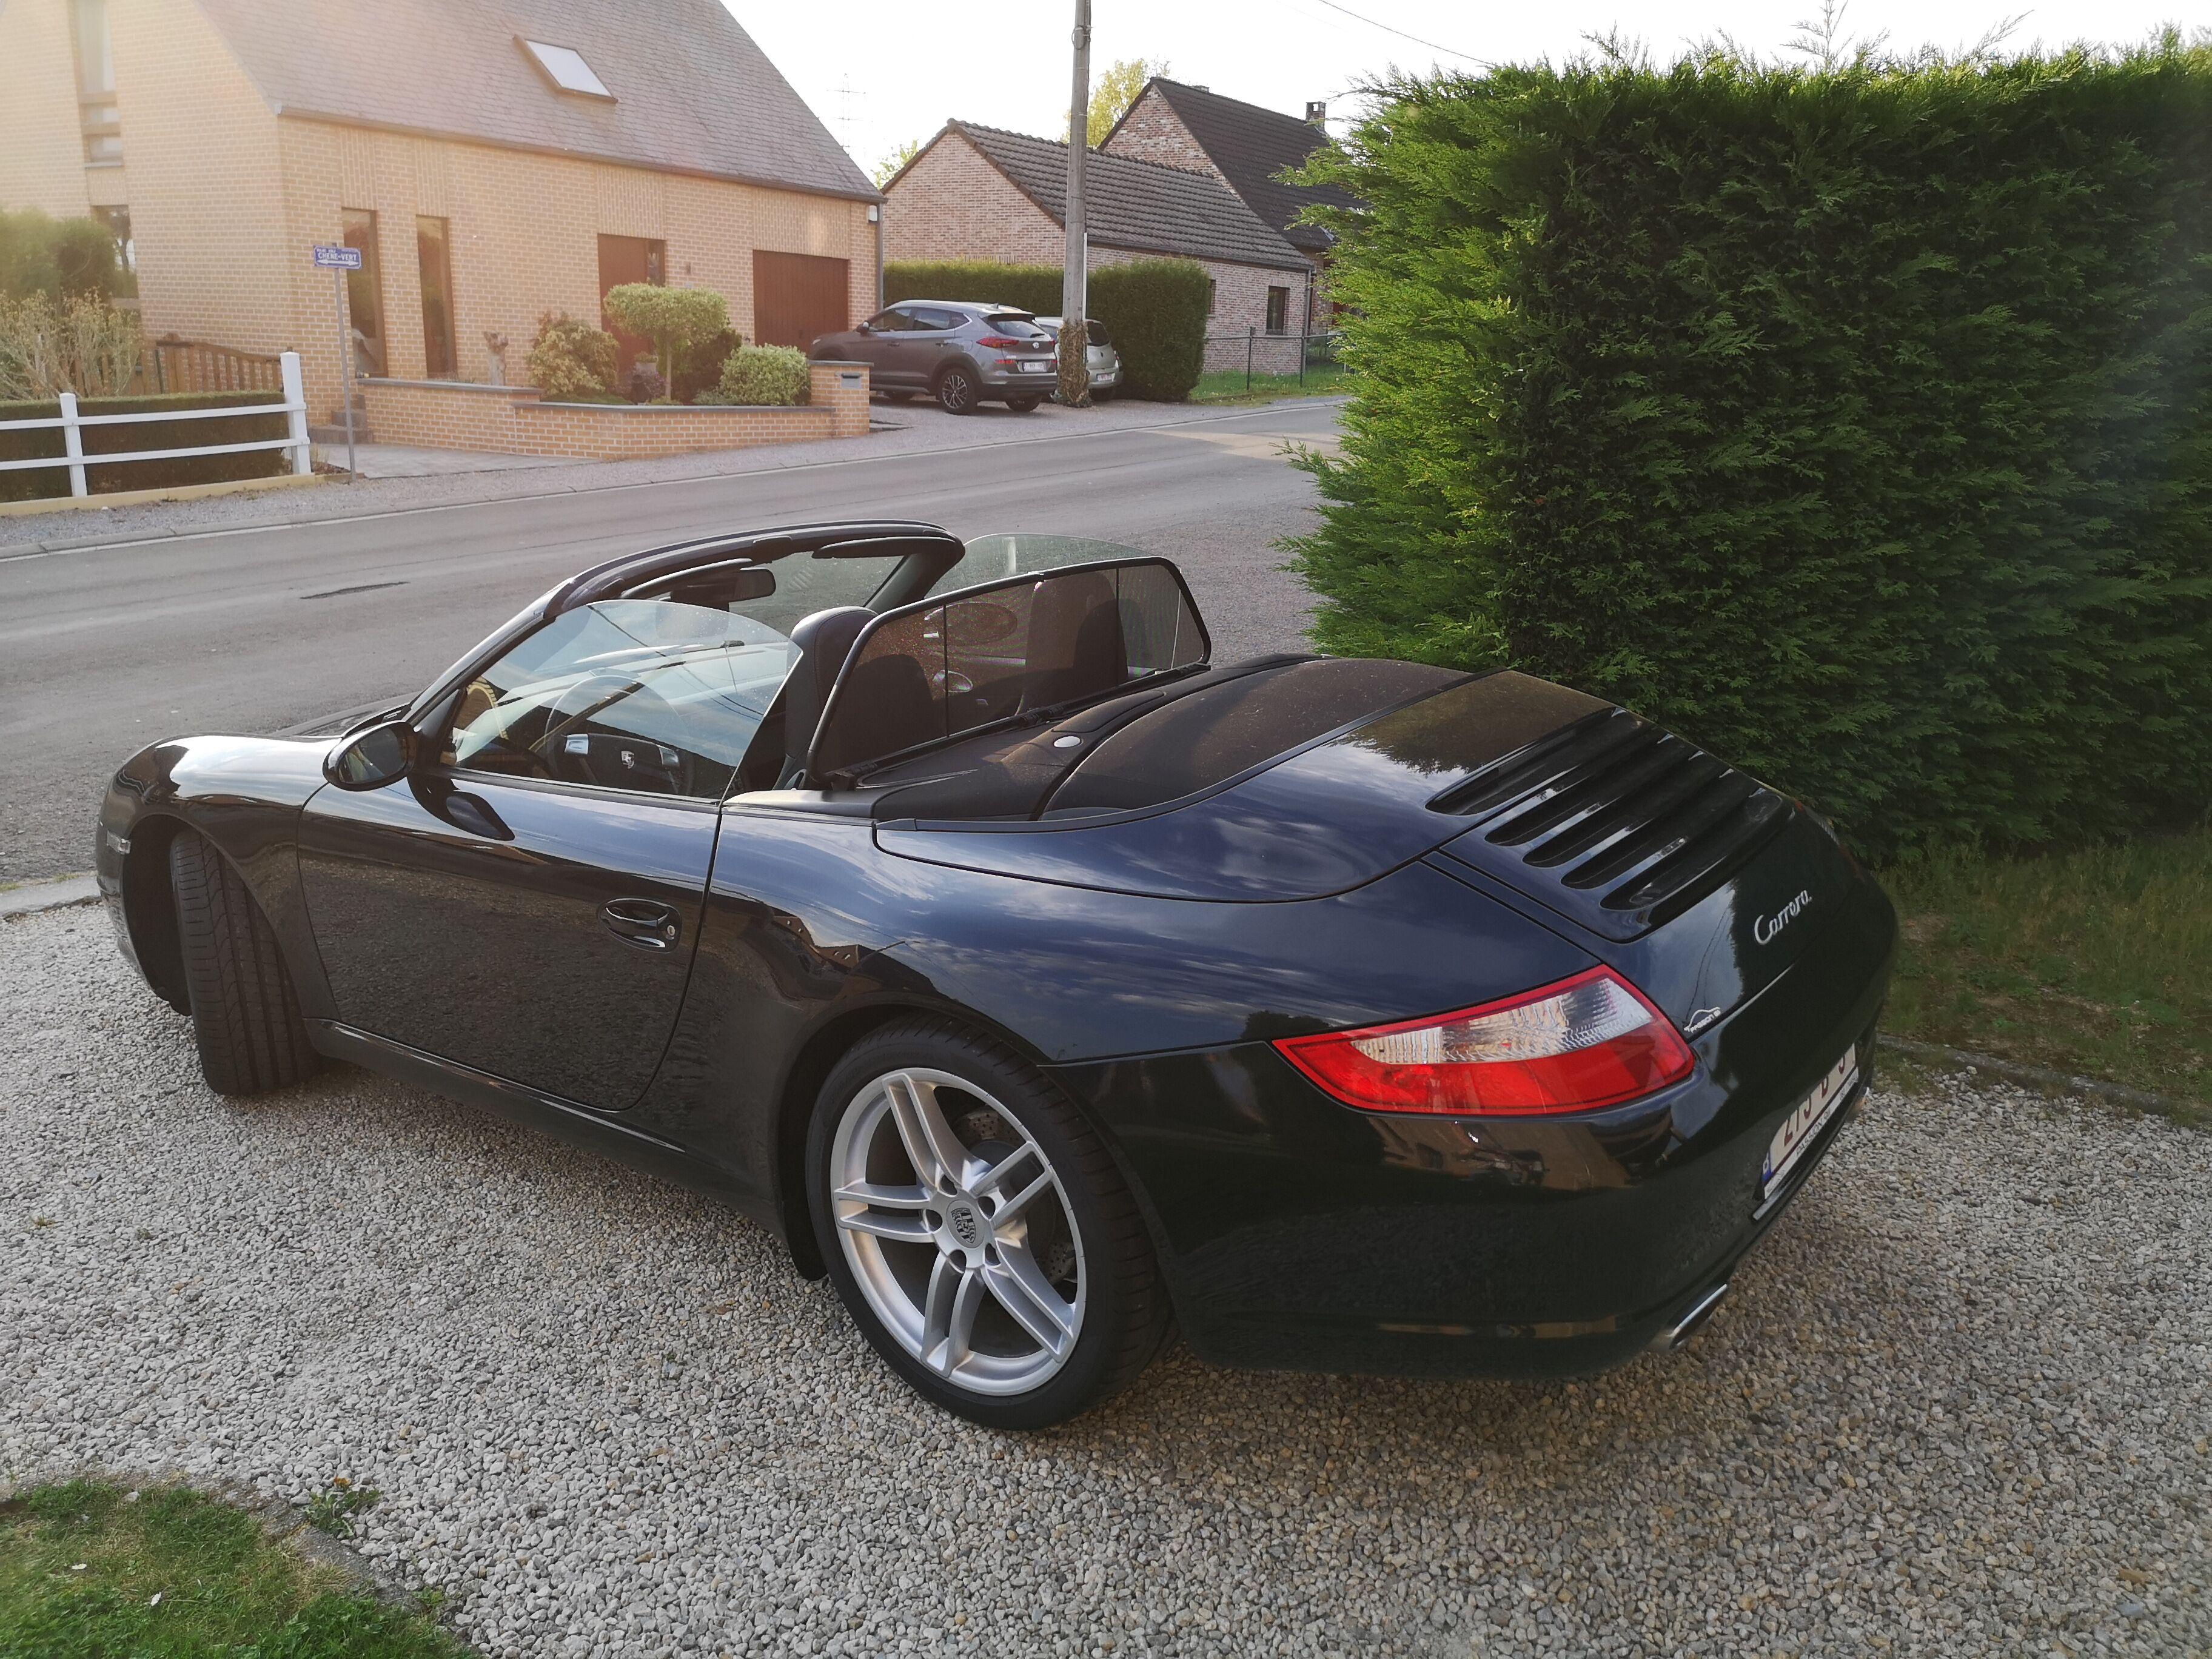 Porsche 911 CARRERA 2 CABRIOLET - 2008 8/15